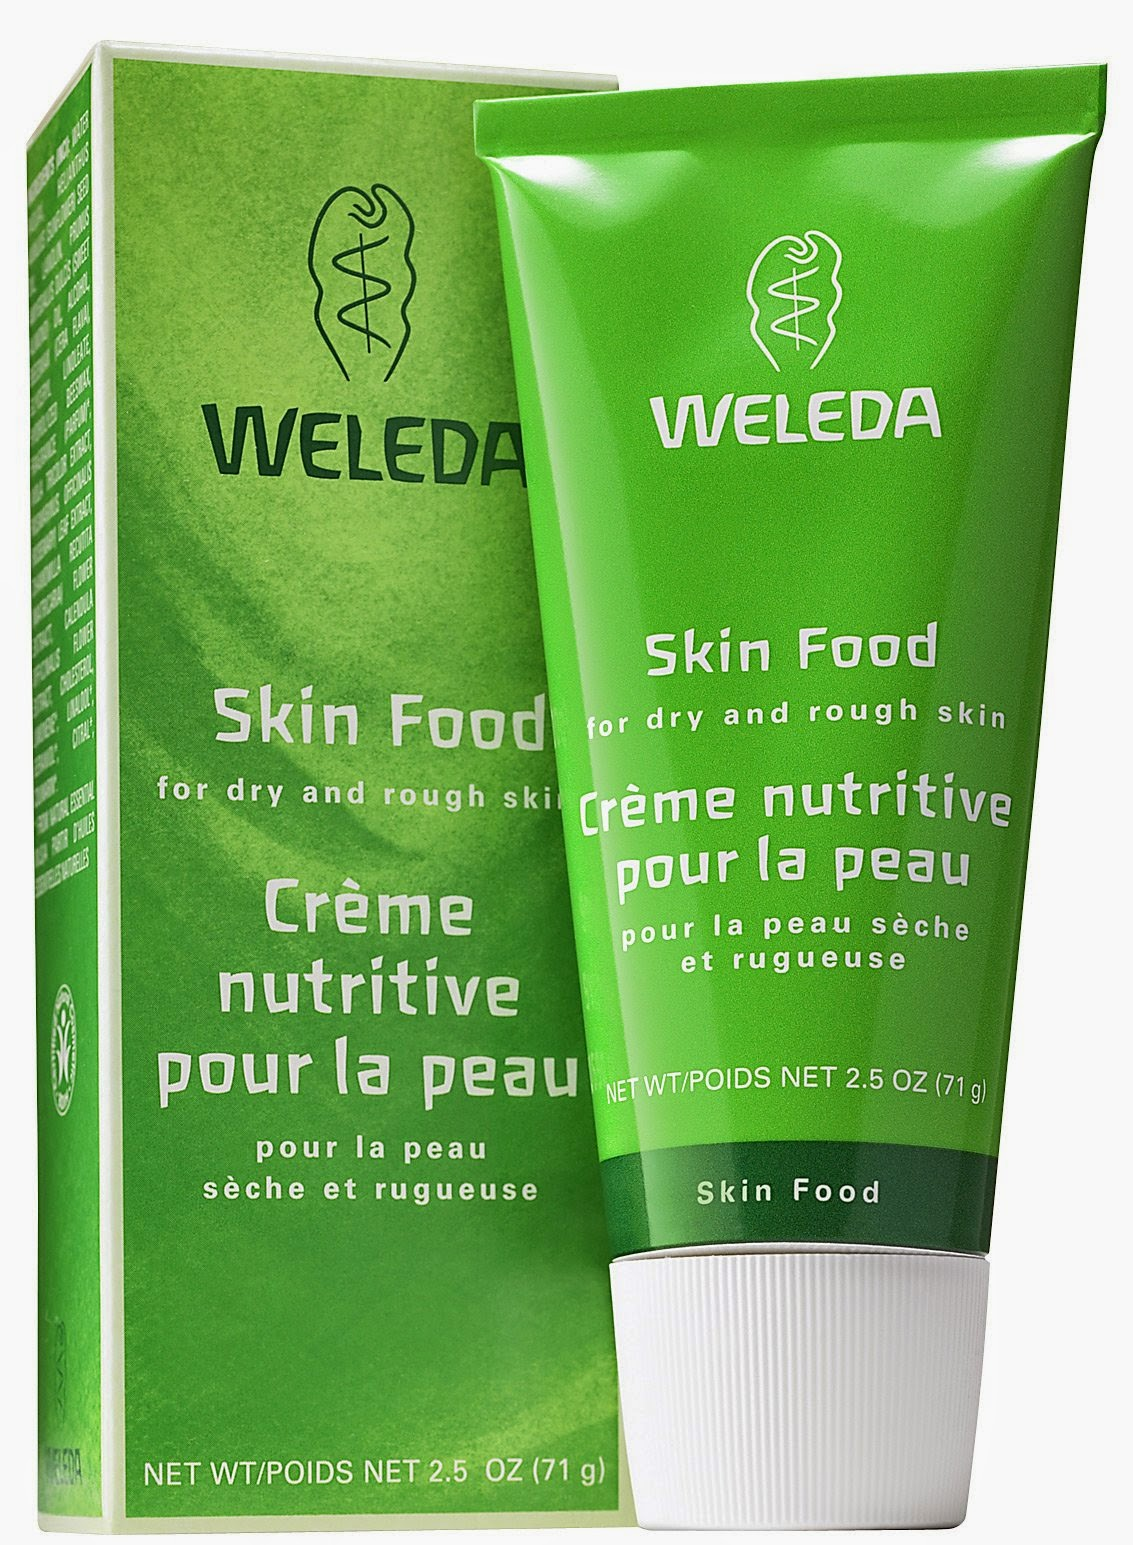 Skin-Food-Weleda